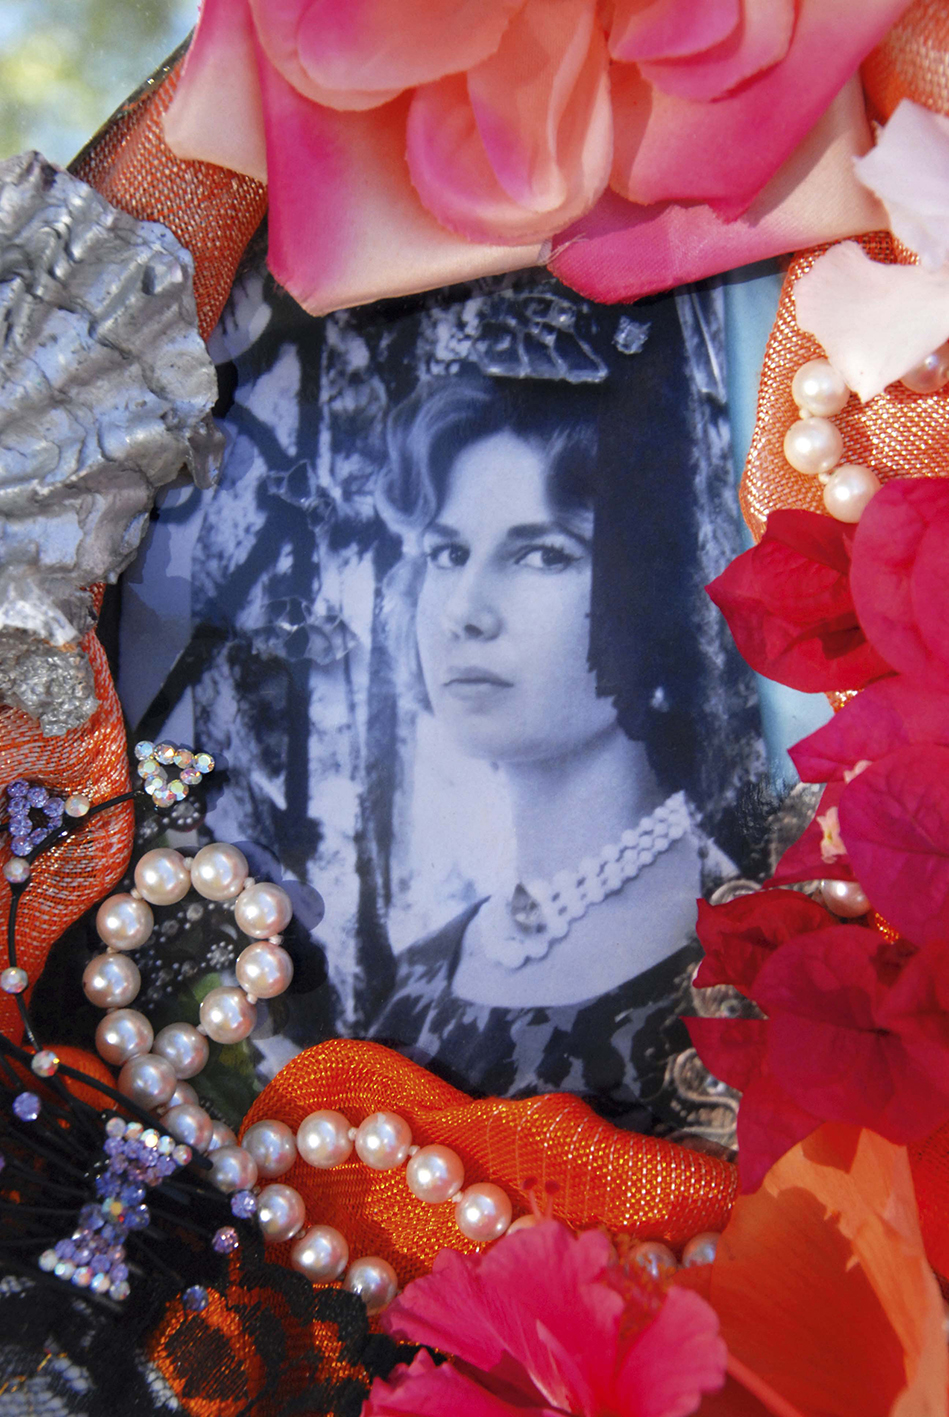 Christine Spengler. Portraits. Duchesse d'Albe à la rose